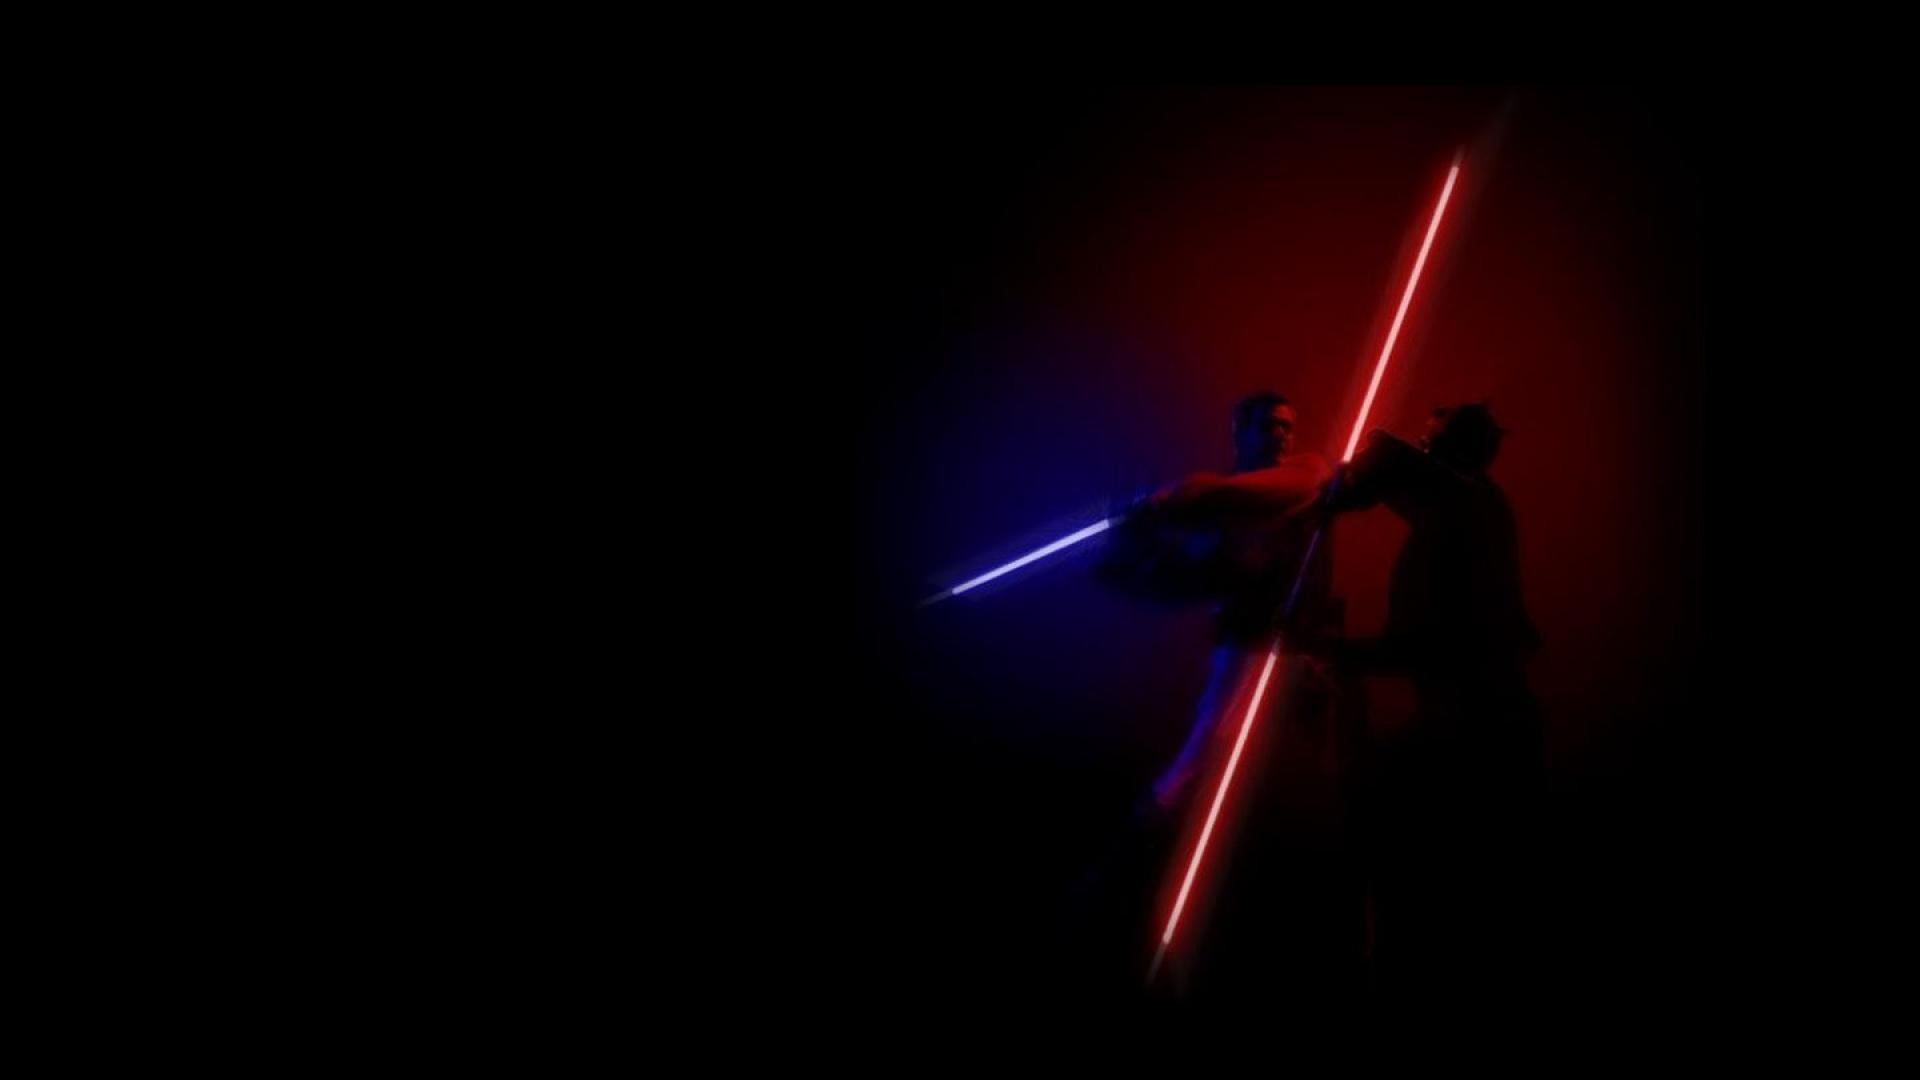 star wars light saber fight battle hd wallpaper – (#5046) – HQ Desktop